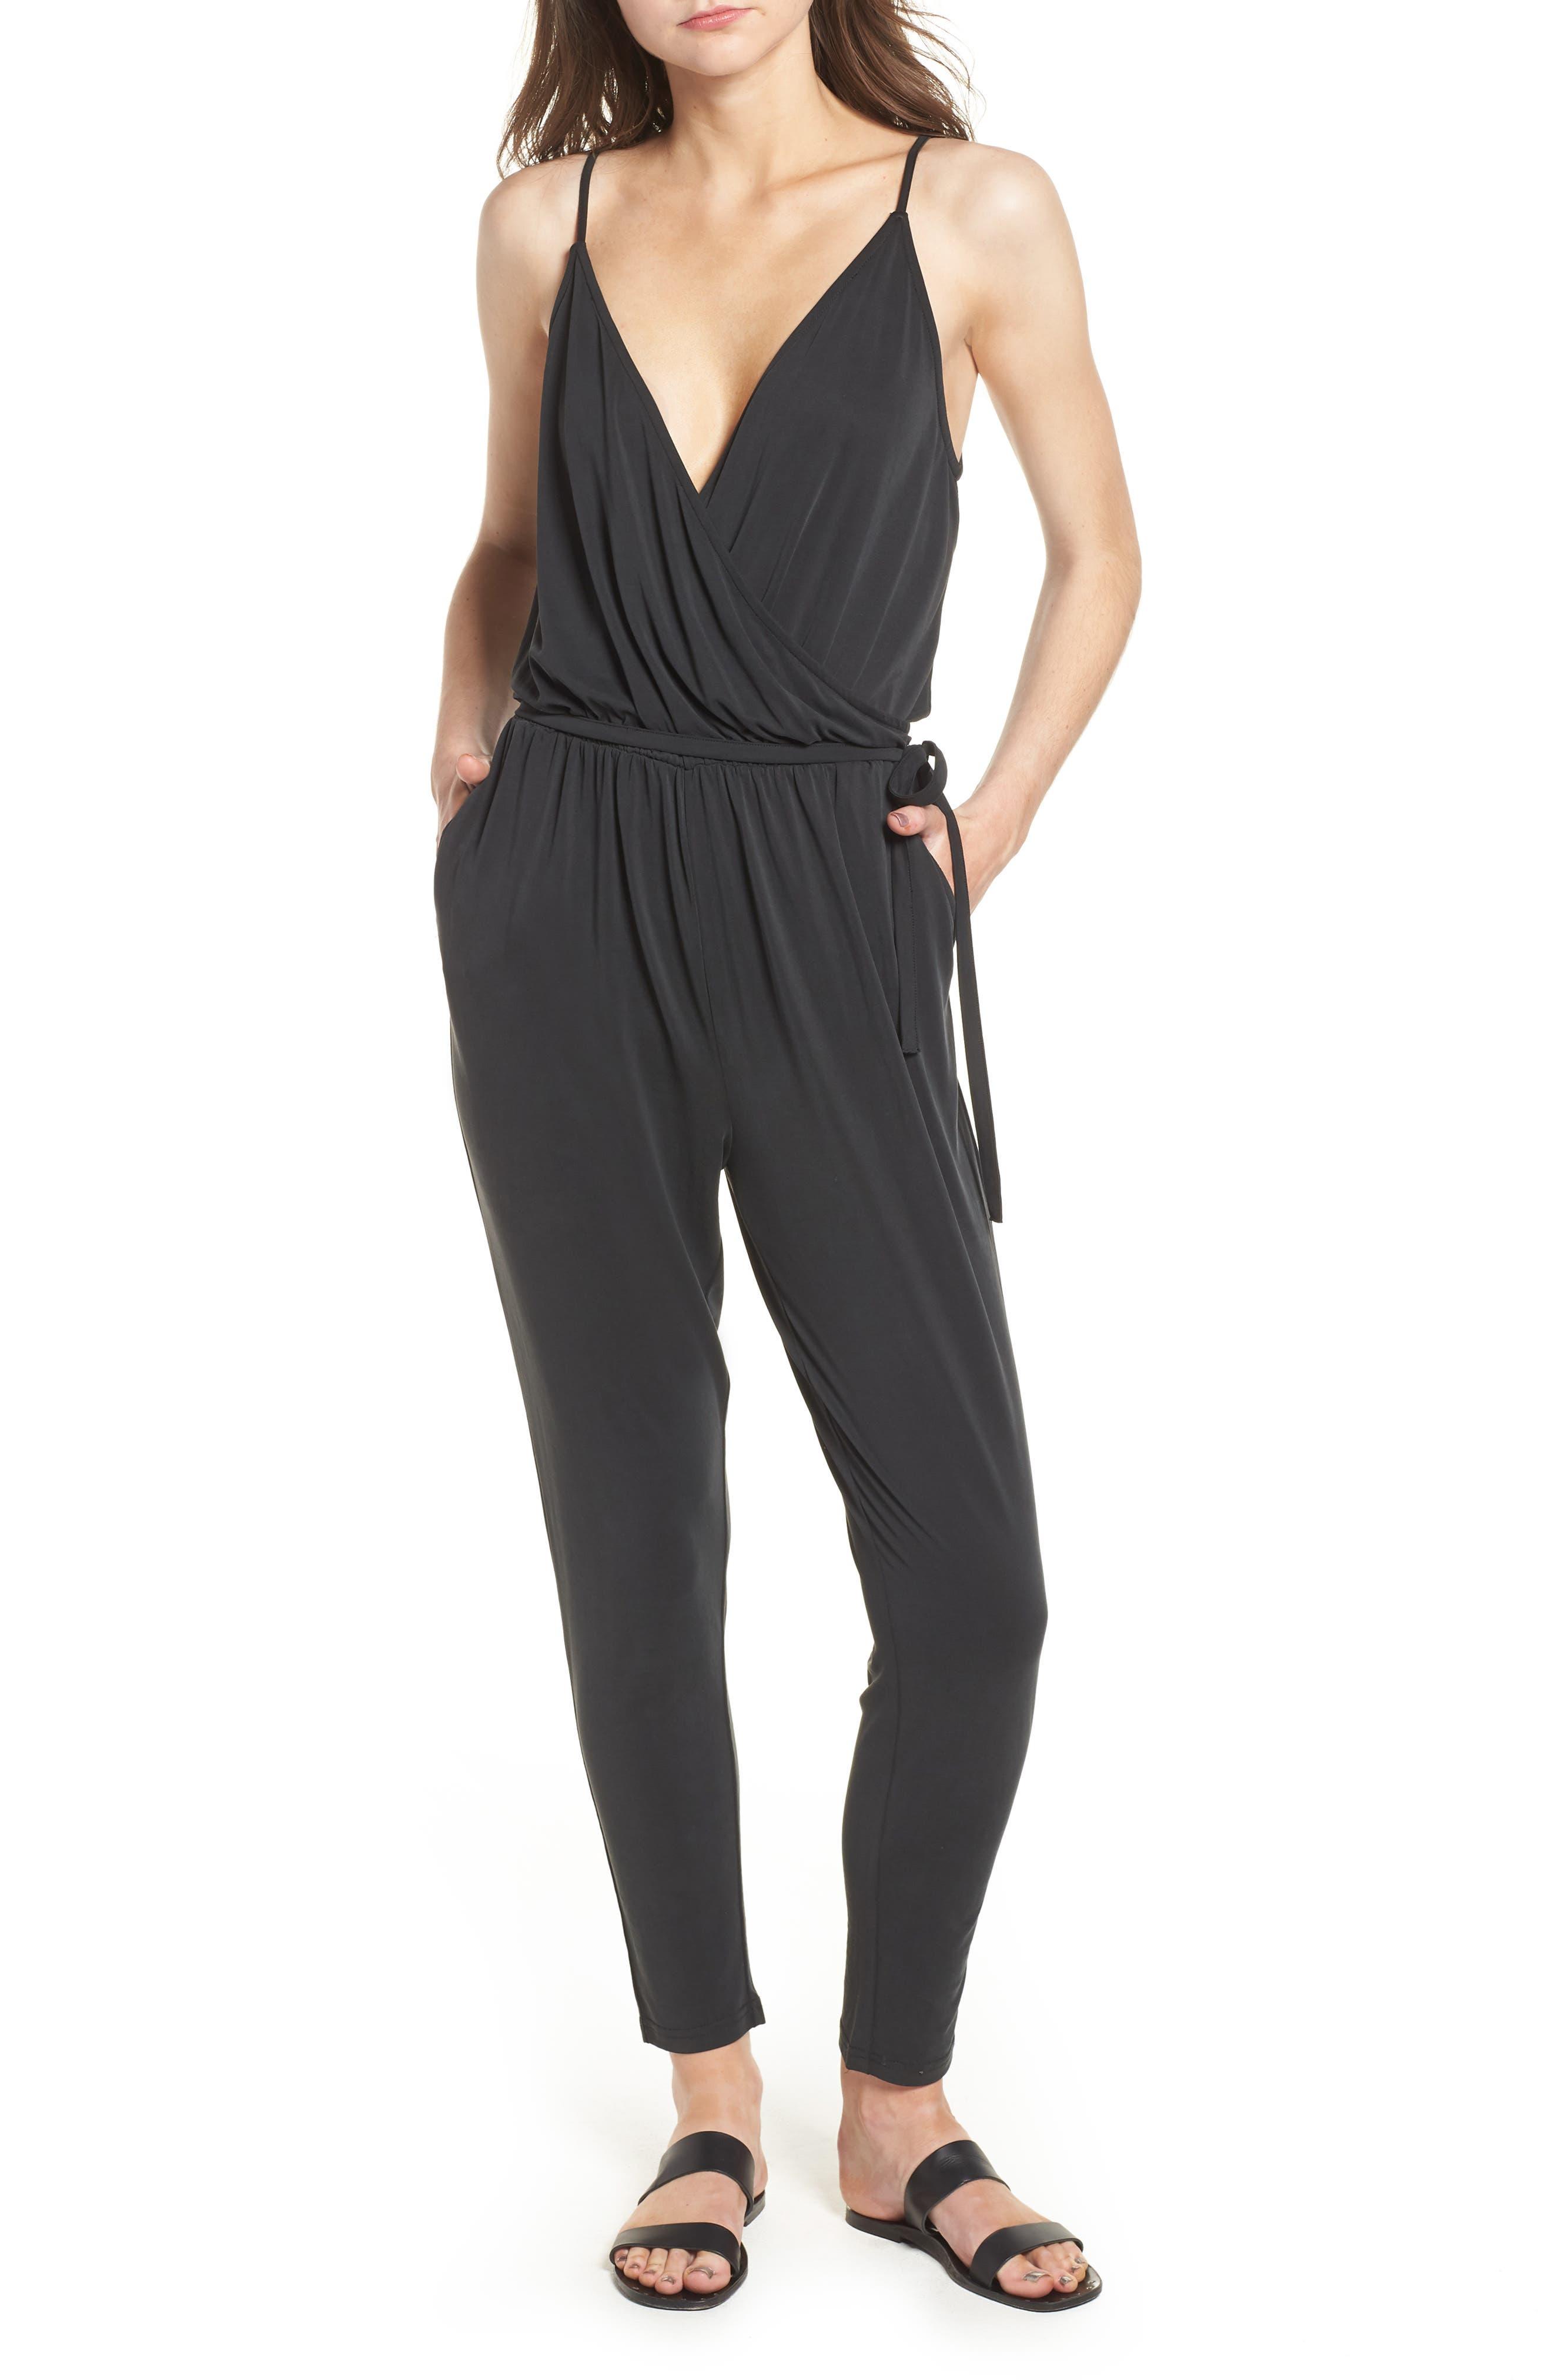 LIRA CLOTHING Marni Jumpsuit, Main, color, 001